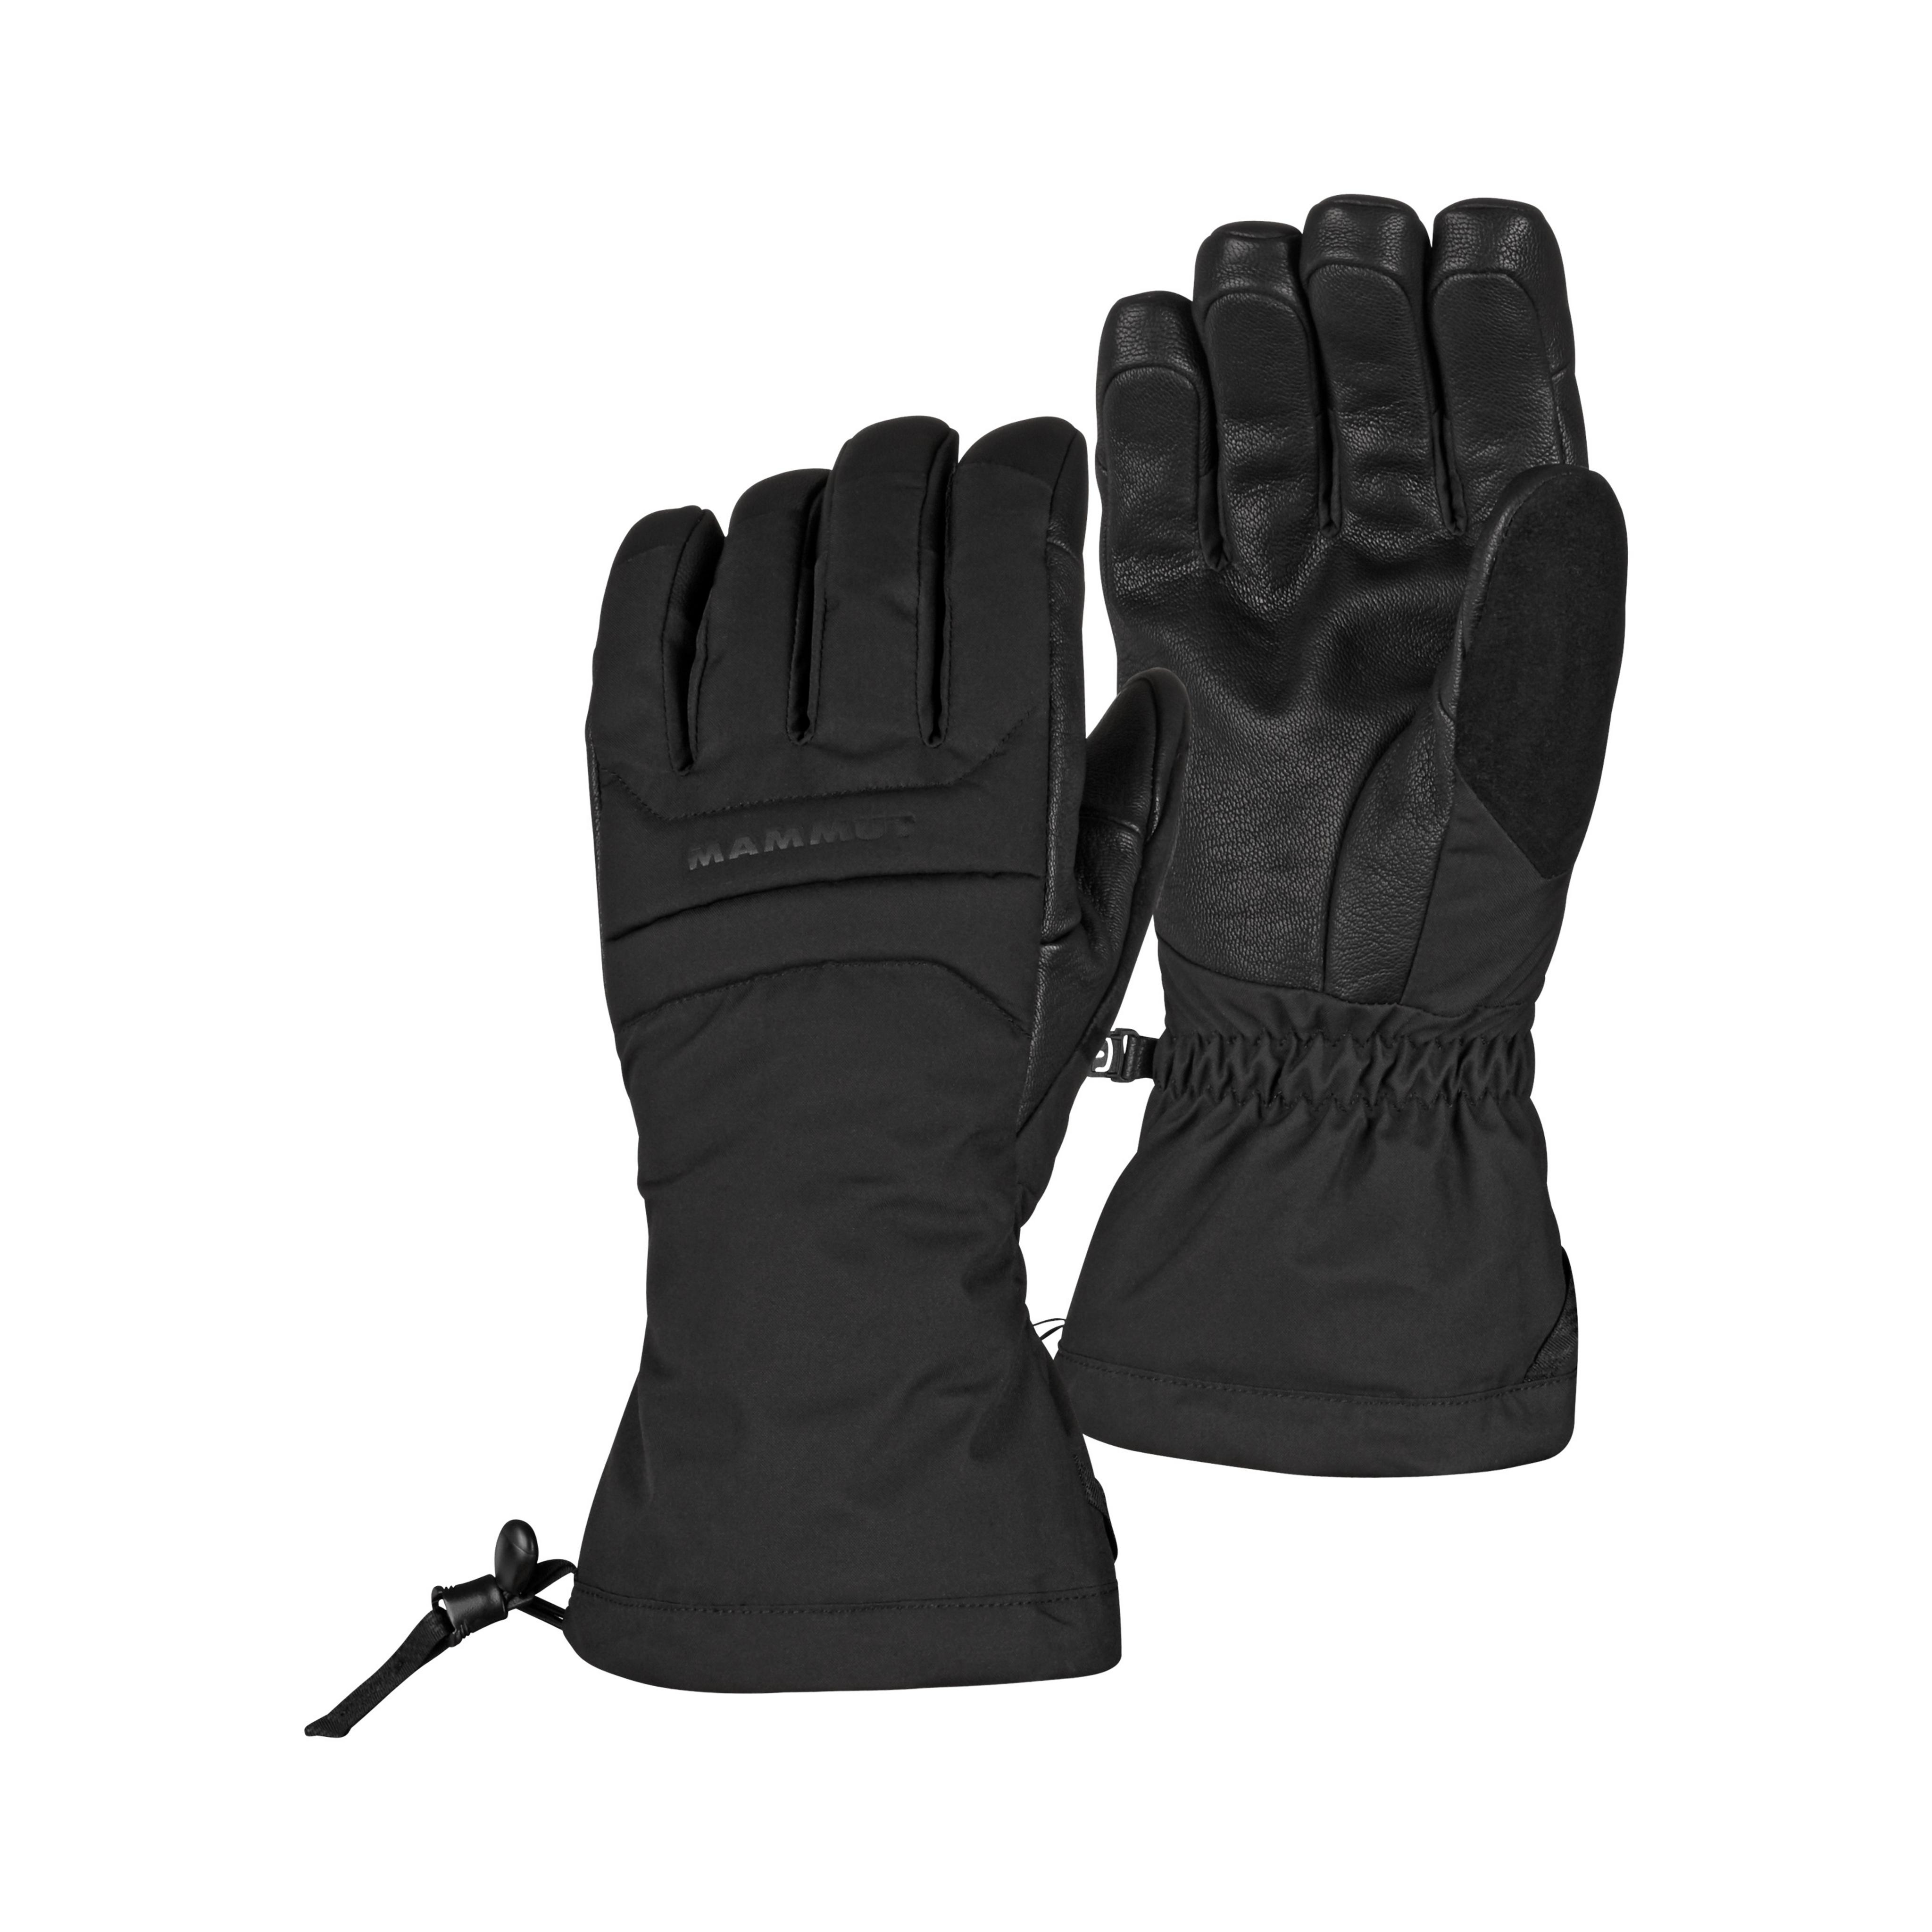 Casanna Glove - 5, black thumbnail